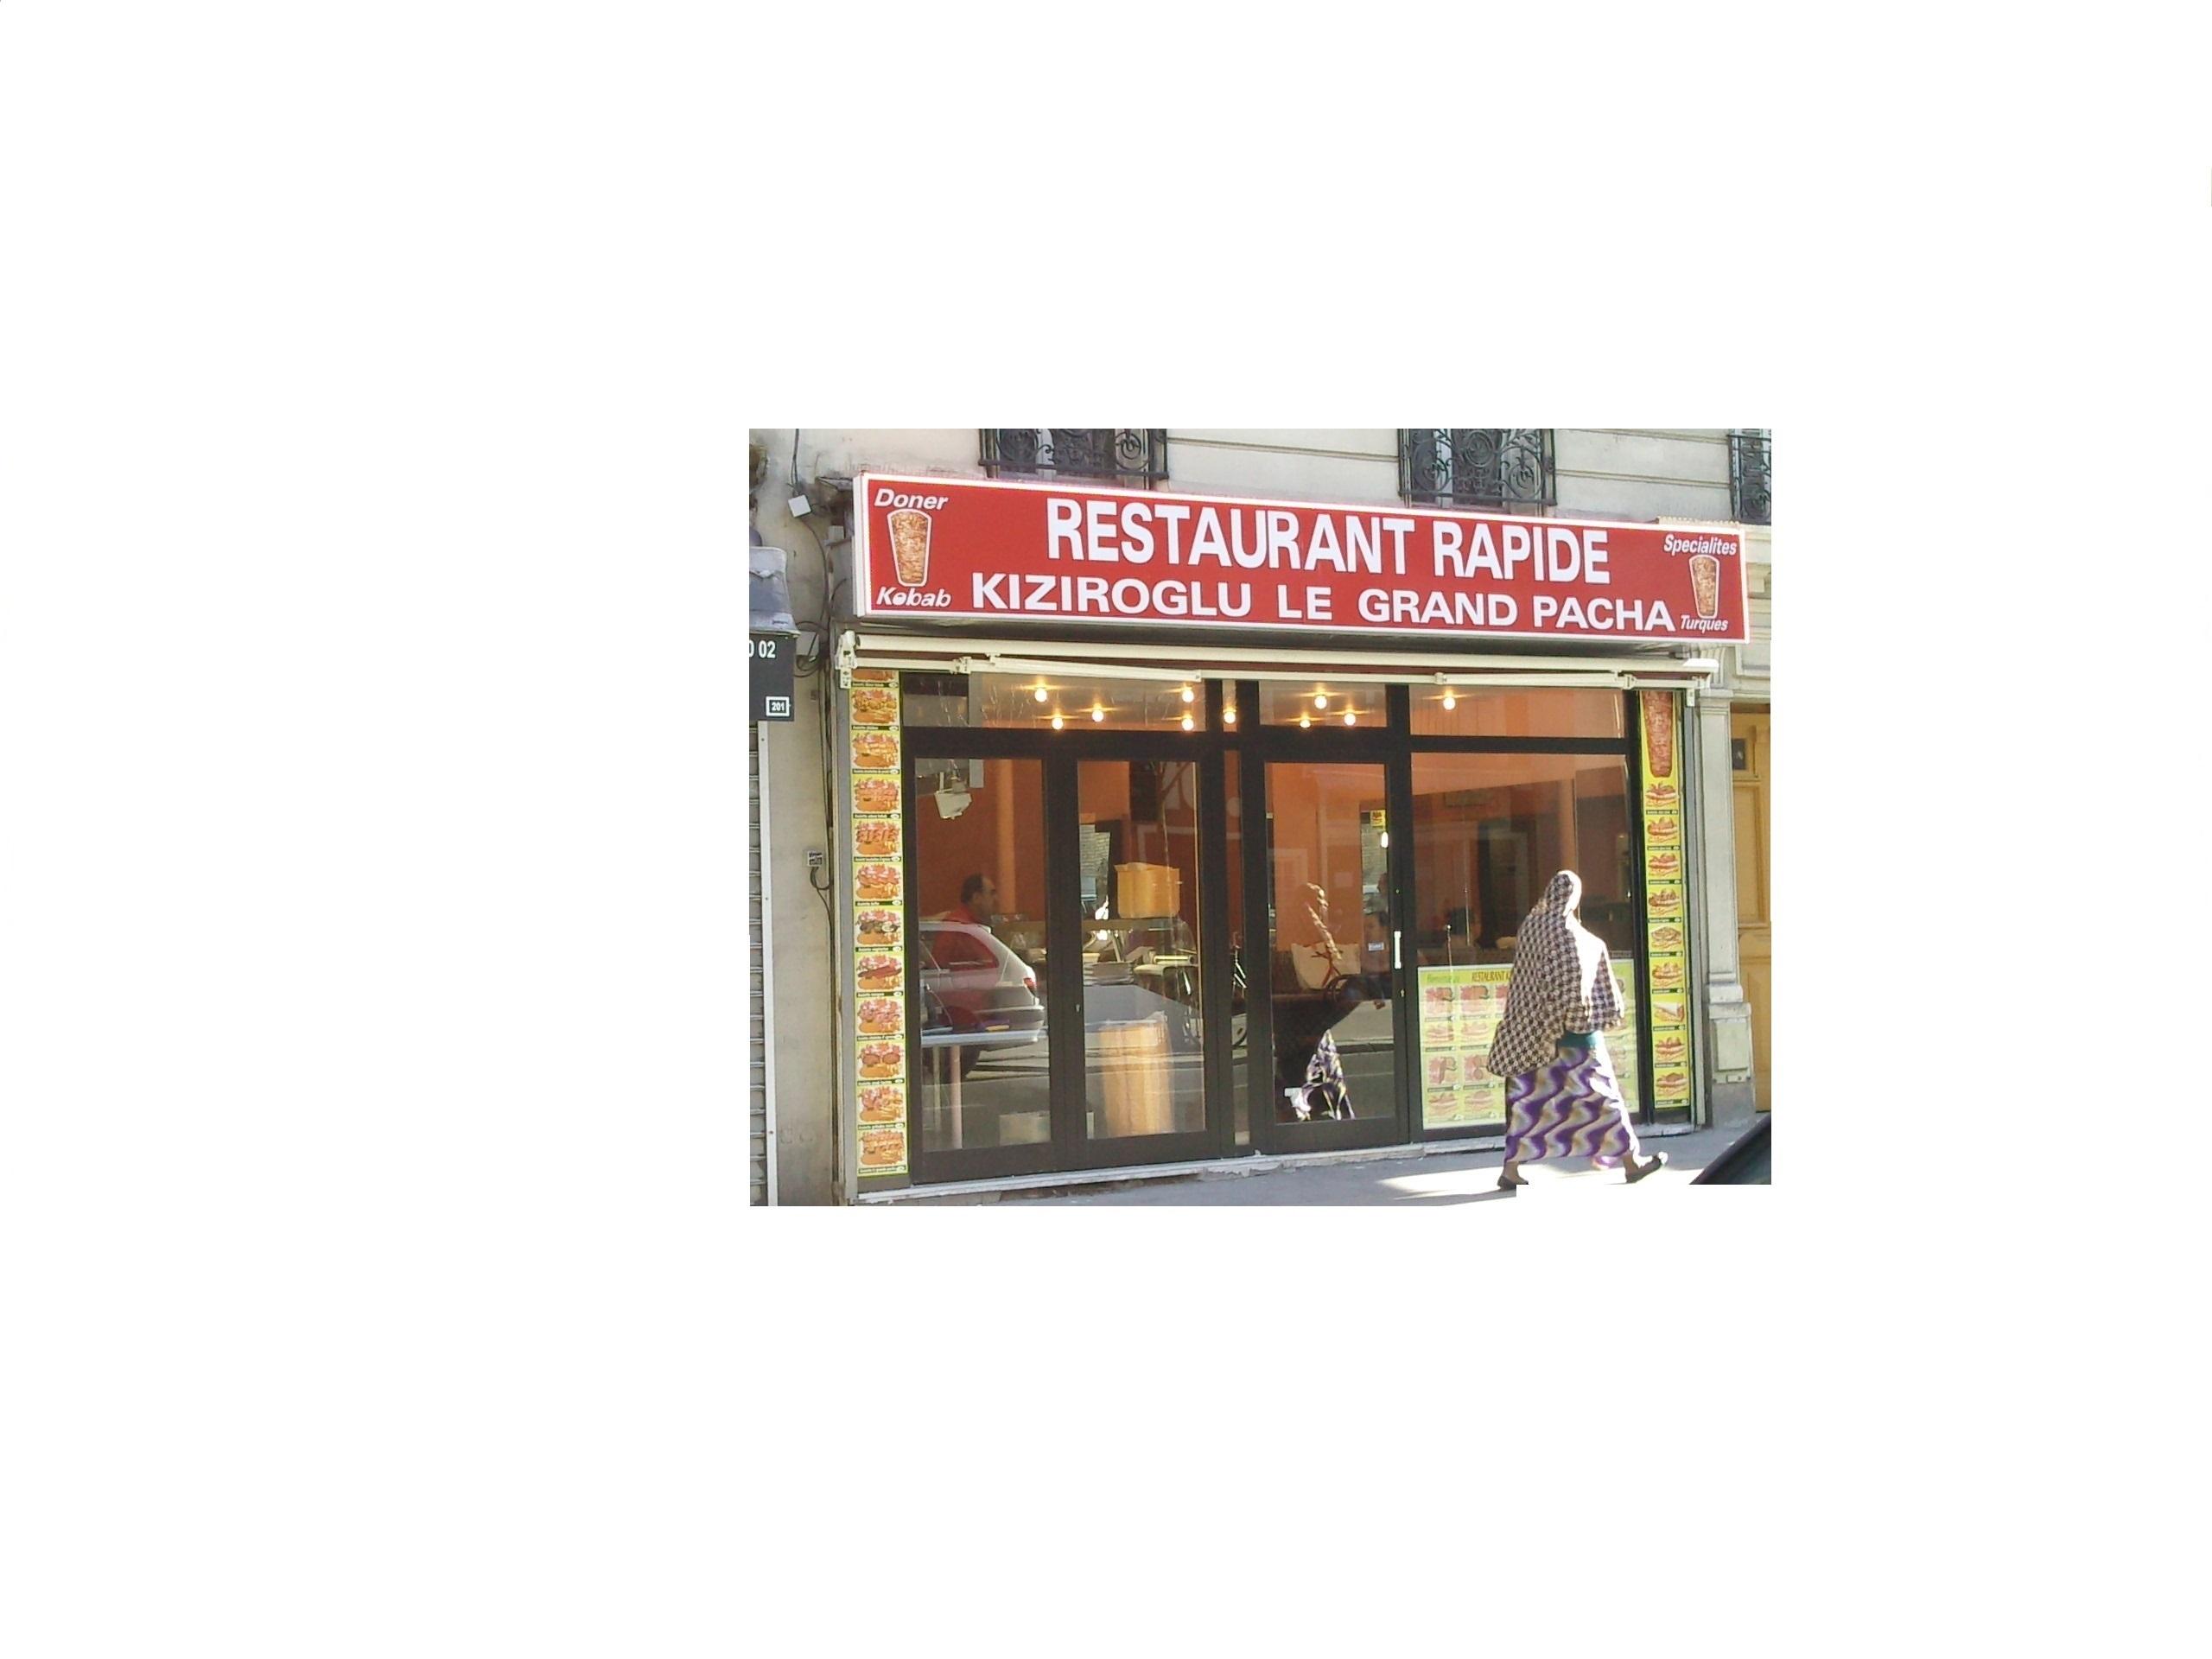 Kiziroglu Le Grand Pacha - Paris 14